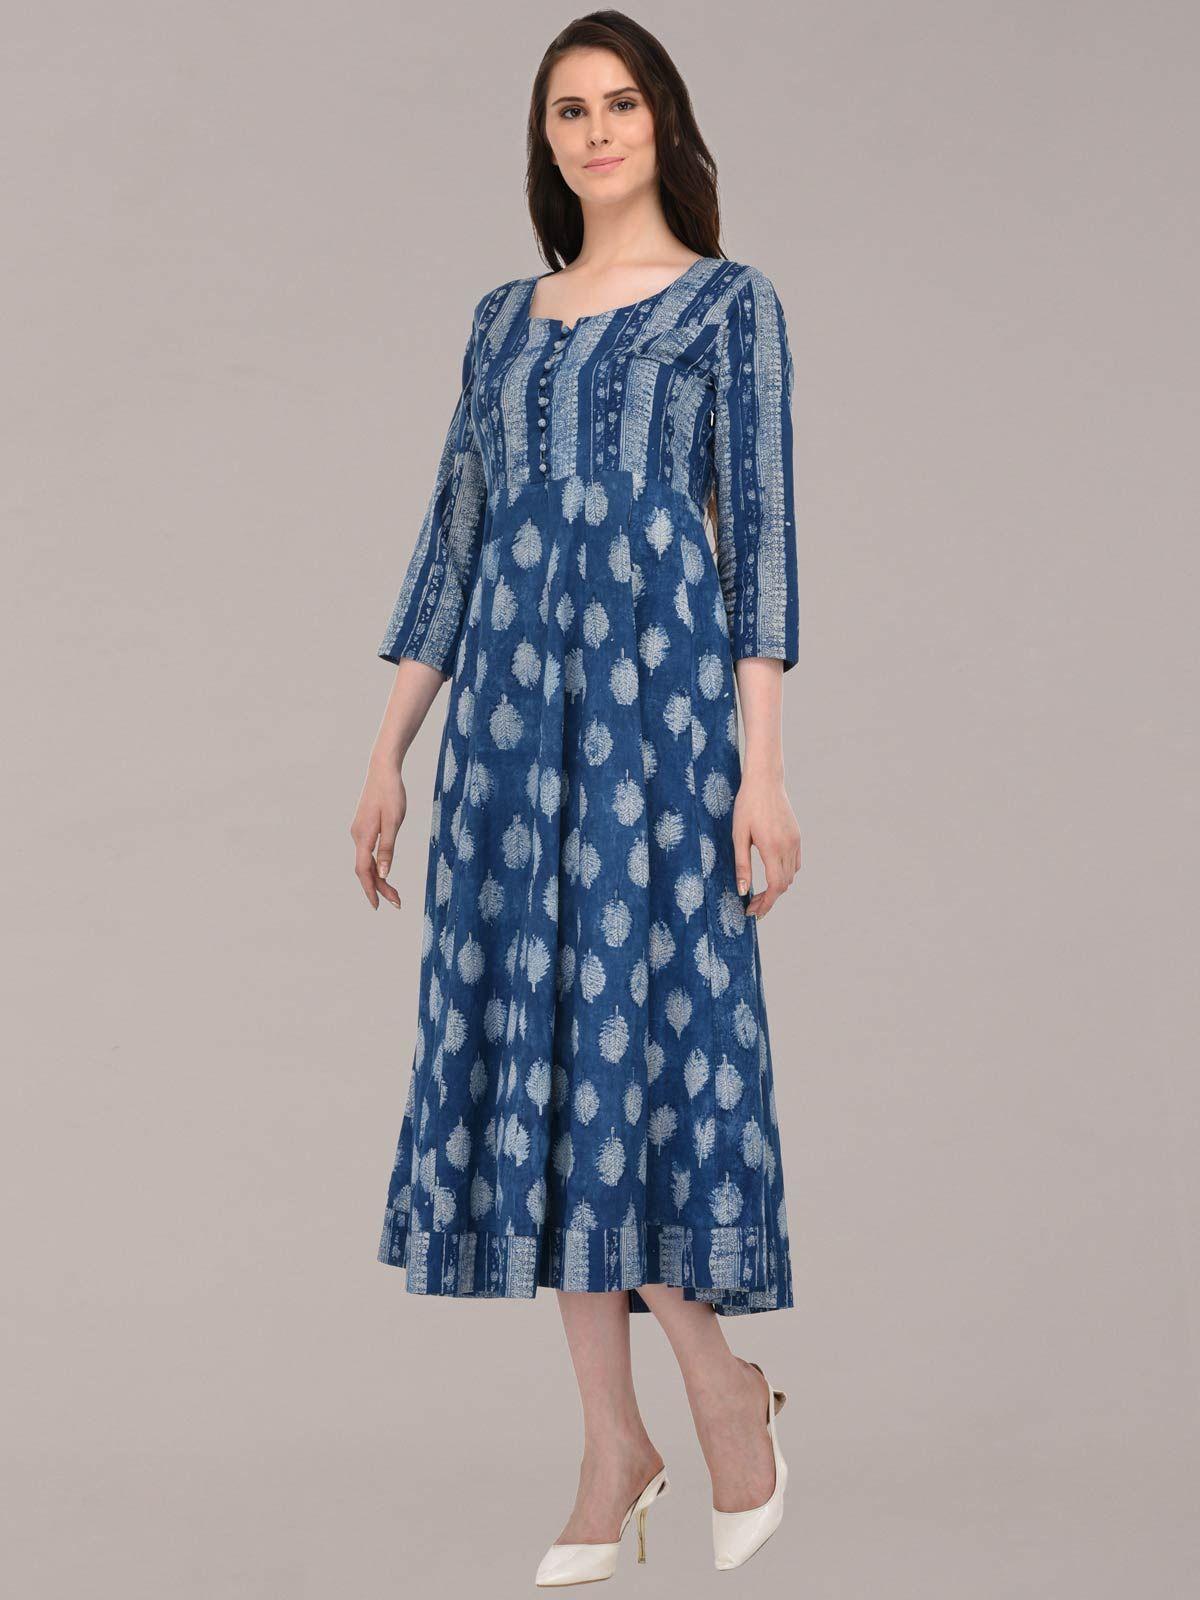 Azure indigo color hand-block printed cotton long dress